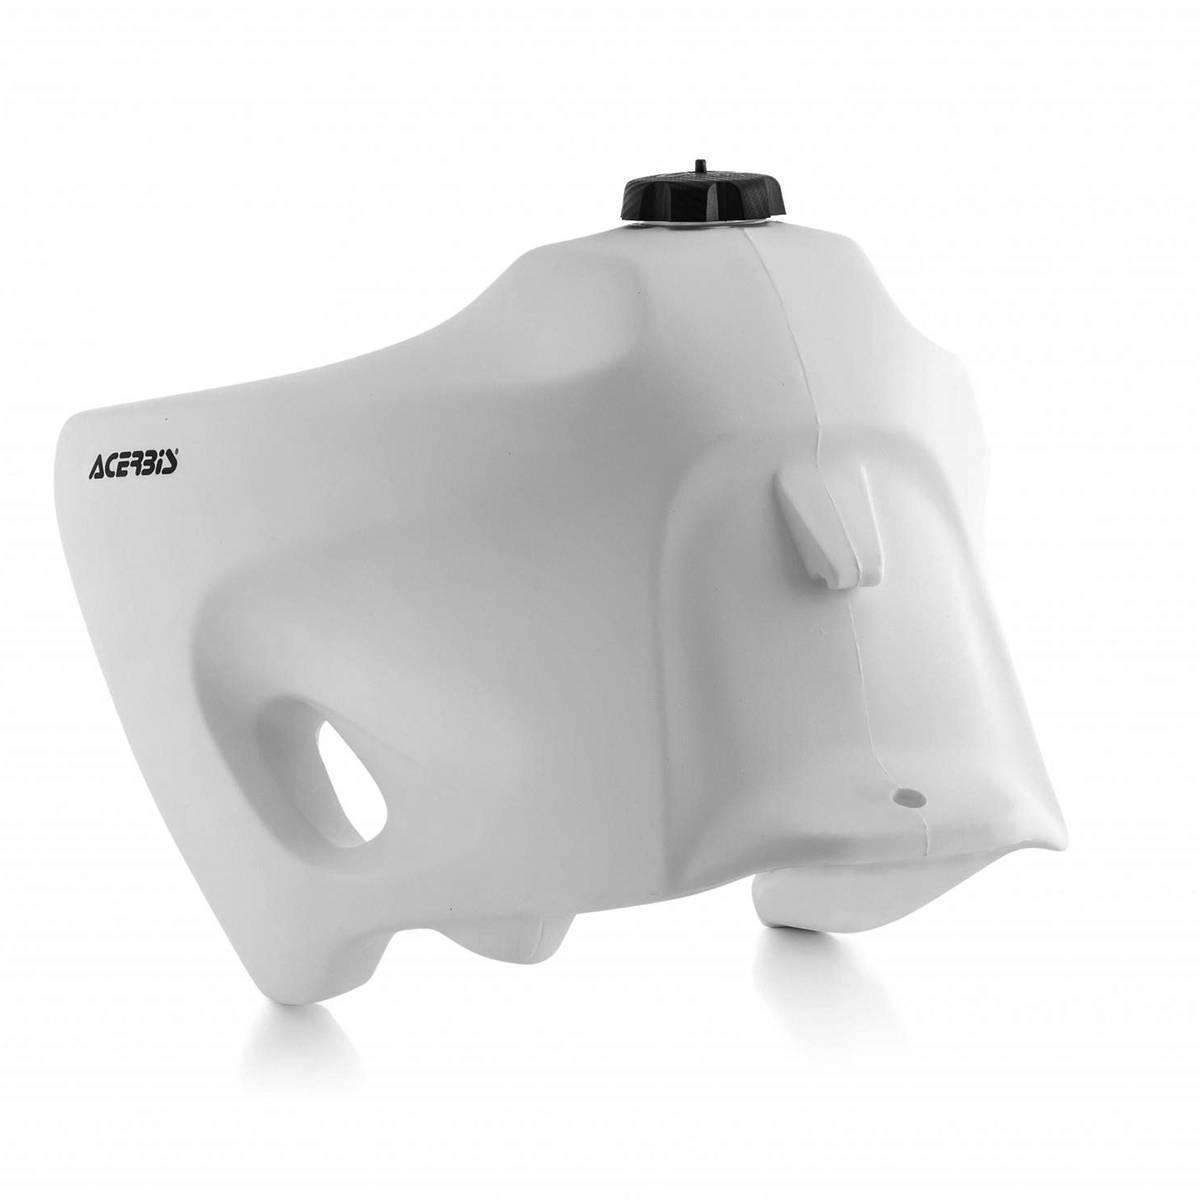 0001599-030 - Deposito Acerbis Yamaha Xt 600 95 03 23 Litros Blanco